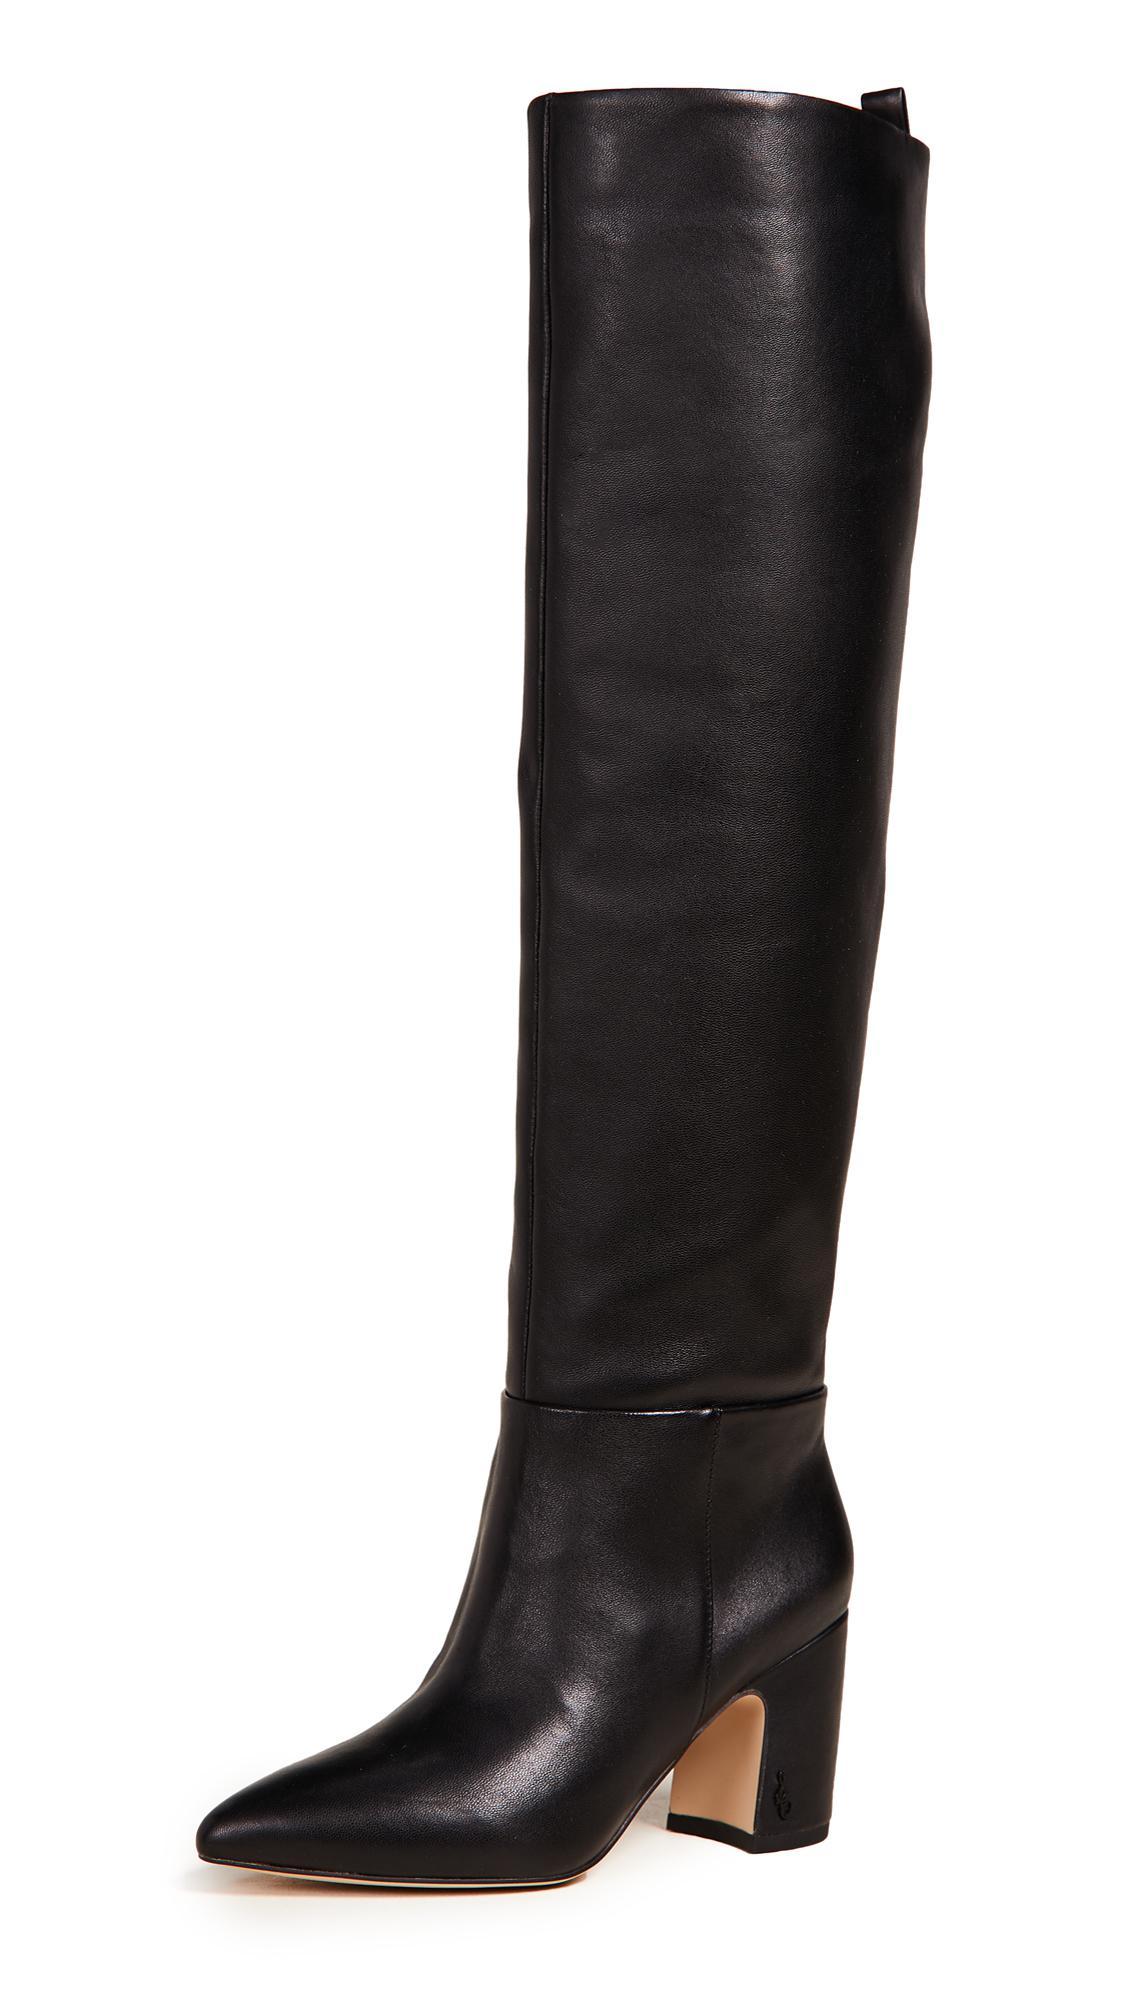 fbfb273fa27ef4 Sam Edelman Hutton Tall Boots in Black - Lyst